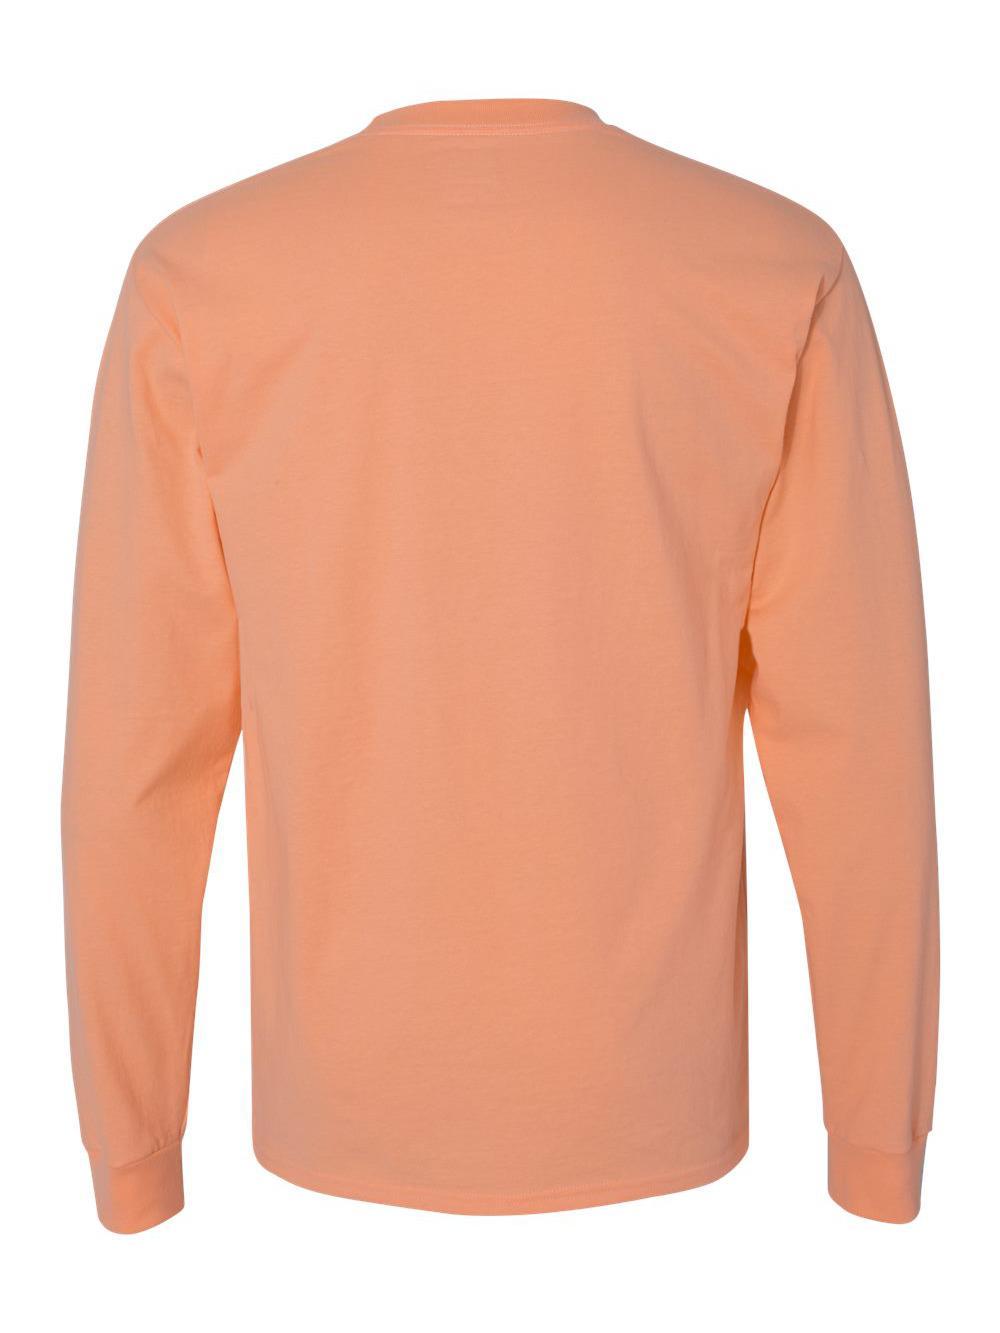 Hanes-Beefy-T-Long-Sleeve-T-Shirt-5186 thumbnail 13